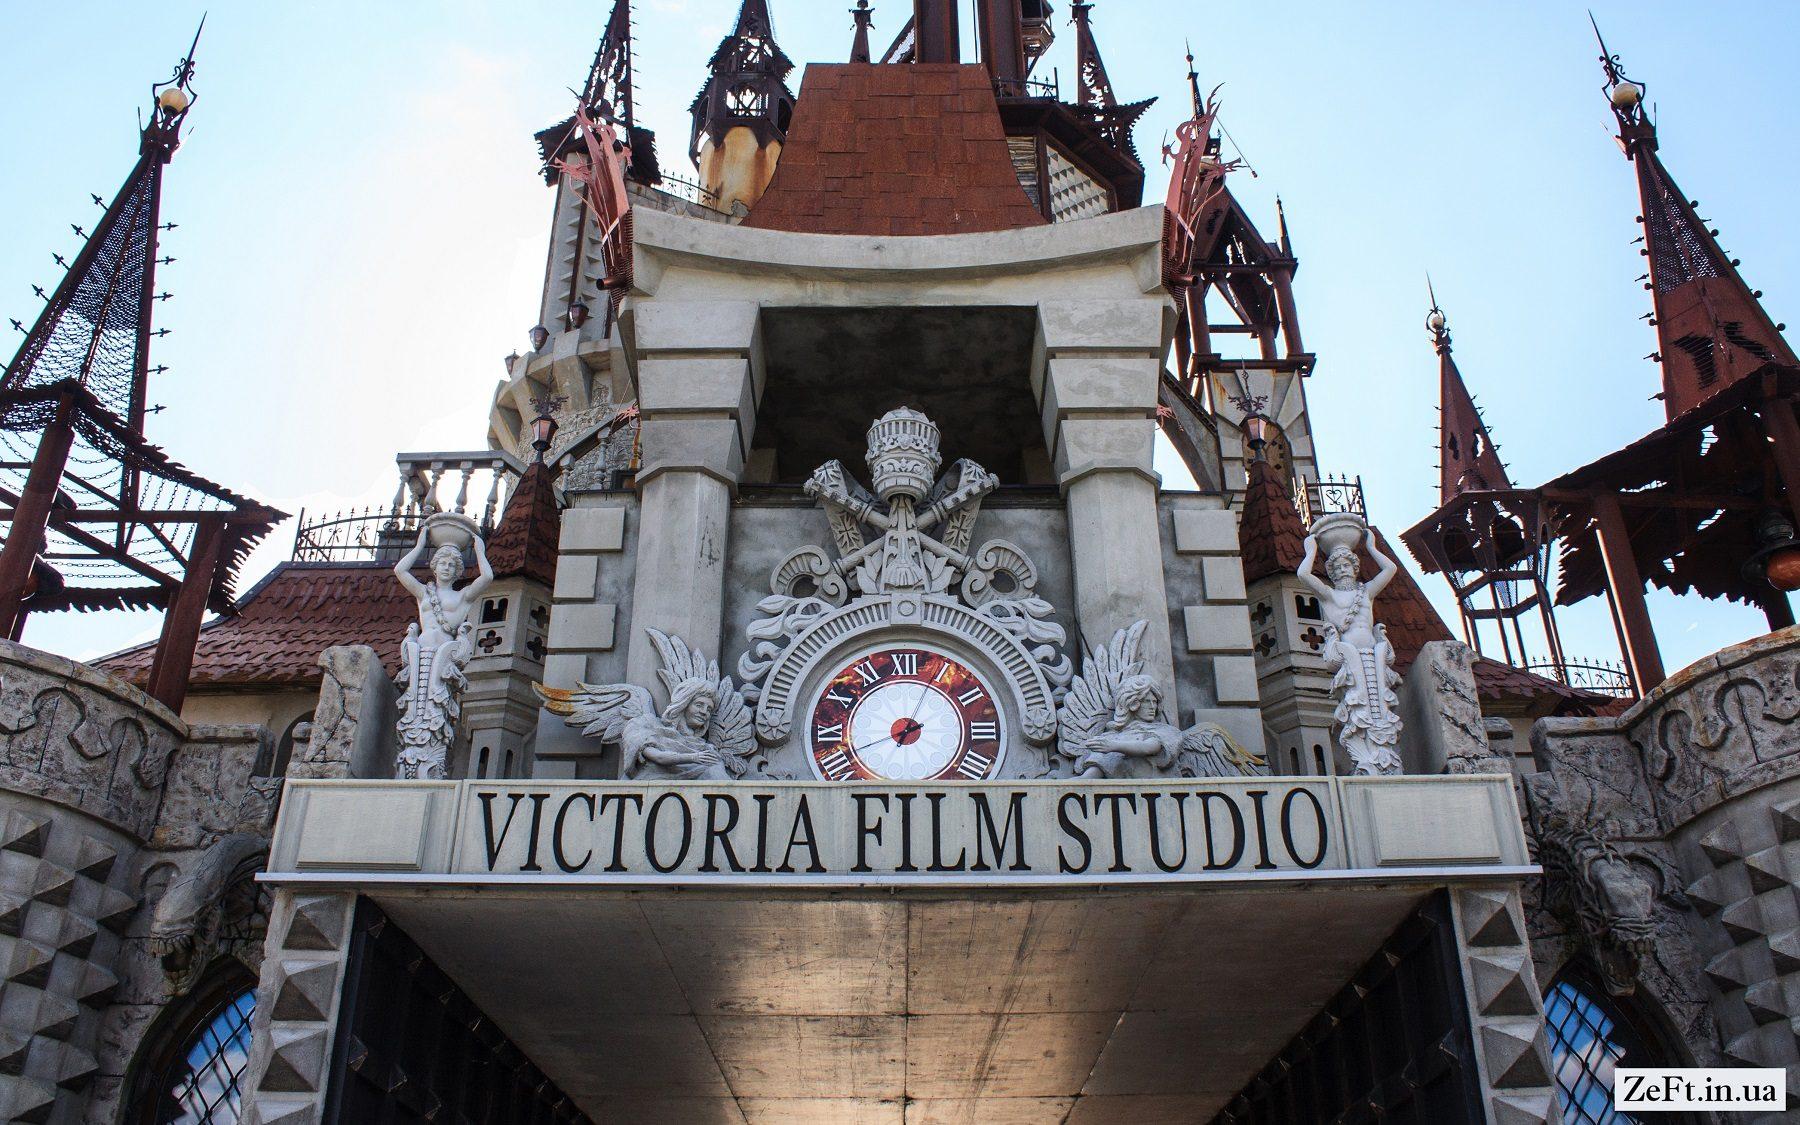 Казковий замок на Київщині -  - Disneyivskij zamok vid kinostudiyi Victoria Film Studios s.Gurivshhina 5 1800x1125